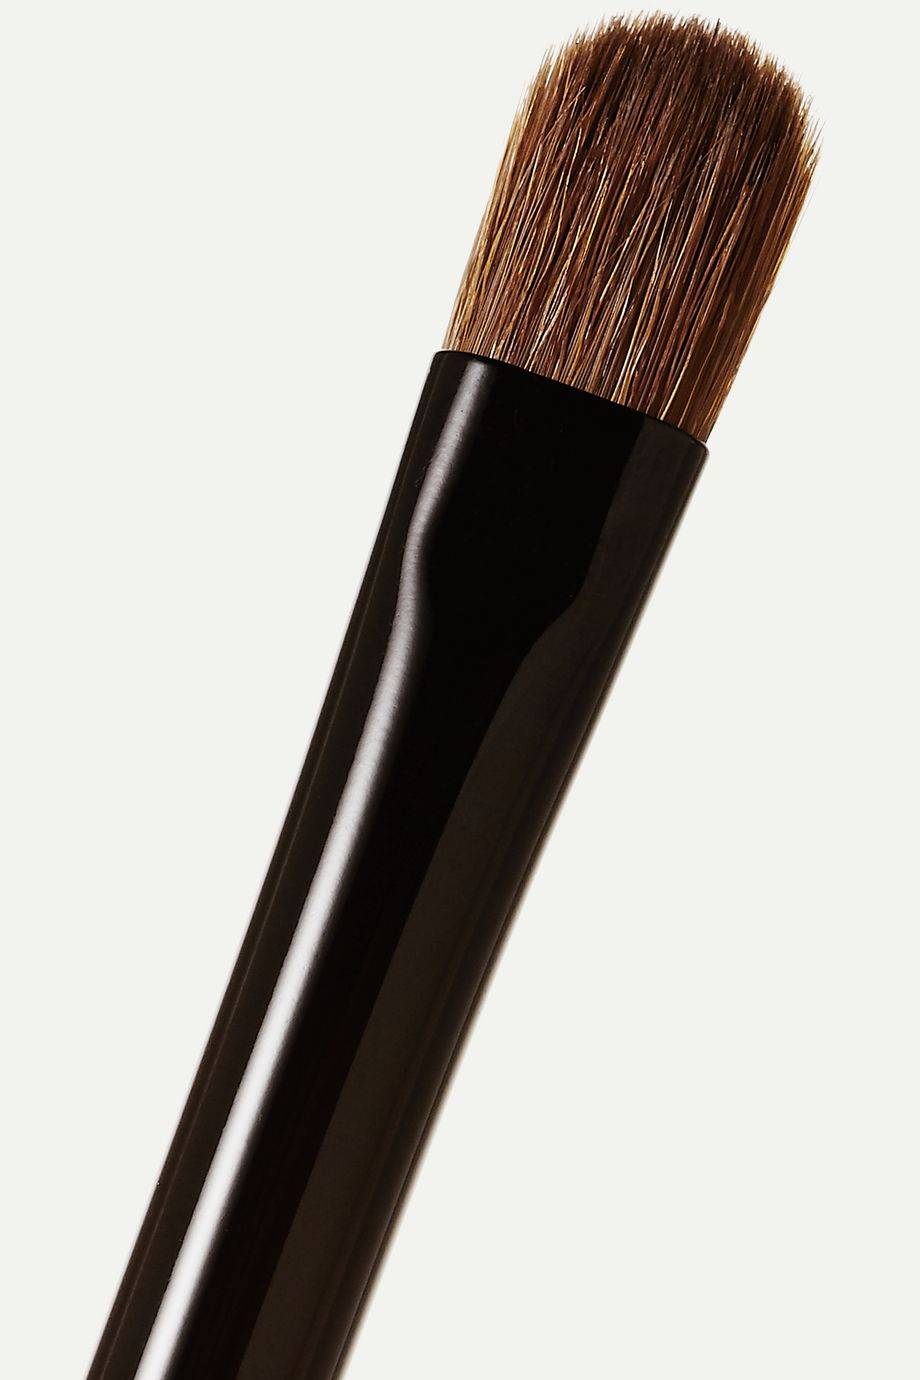 Yves Saint Laurent Beauty Eyeshadow Brush